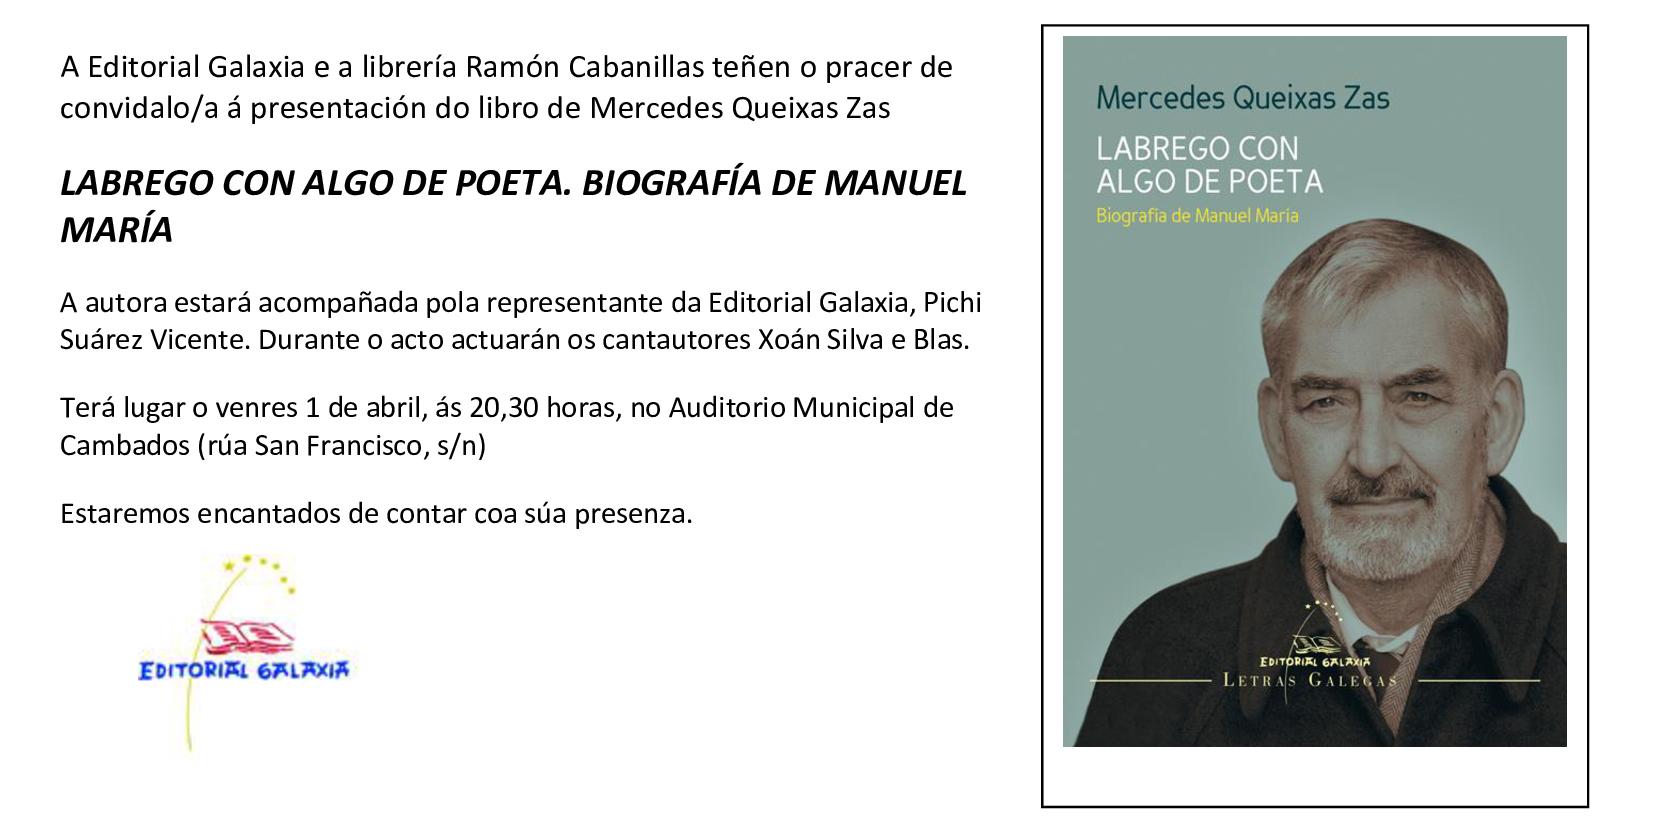 TARXETA_PRESENTACI_N_LABREGO_CON_ALGO_DE_POETA_